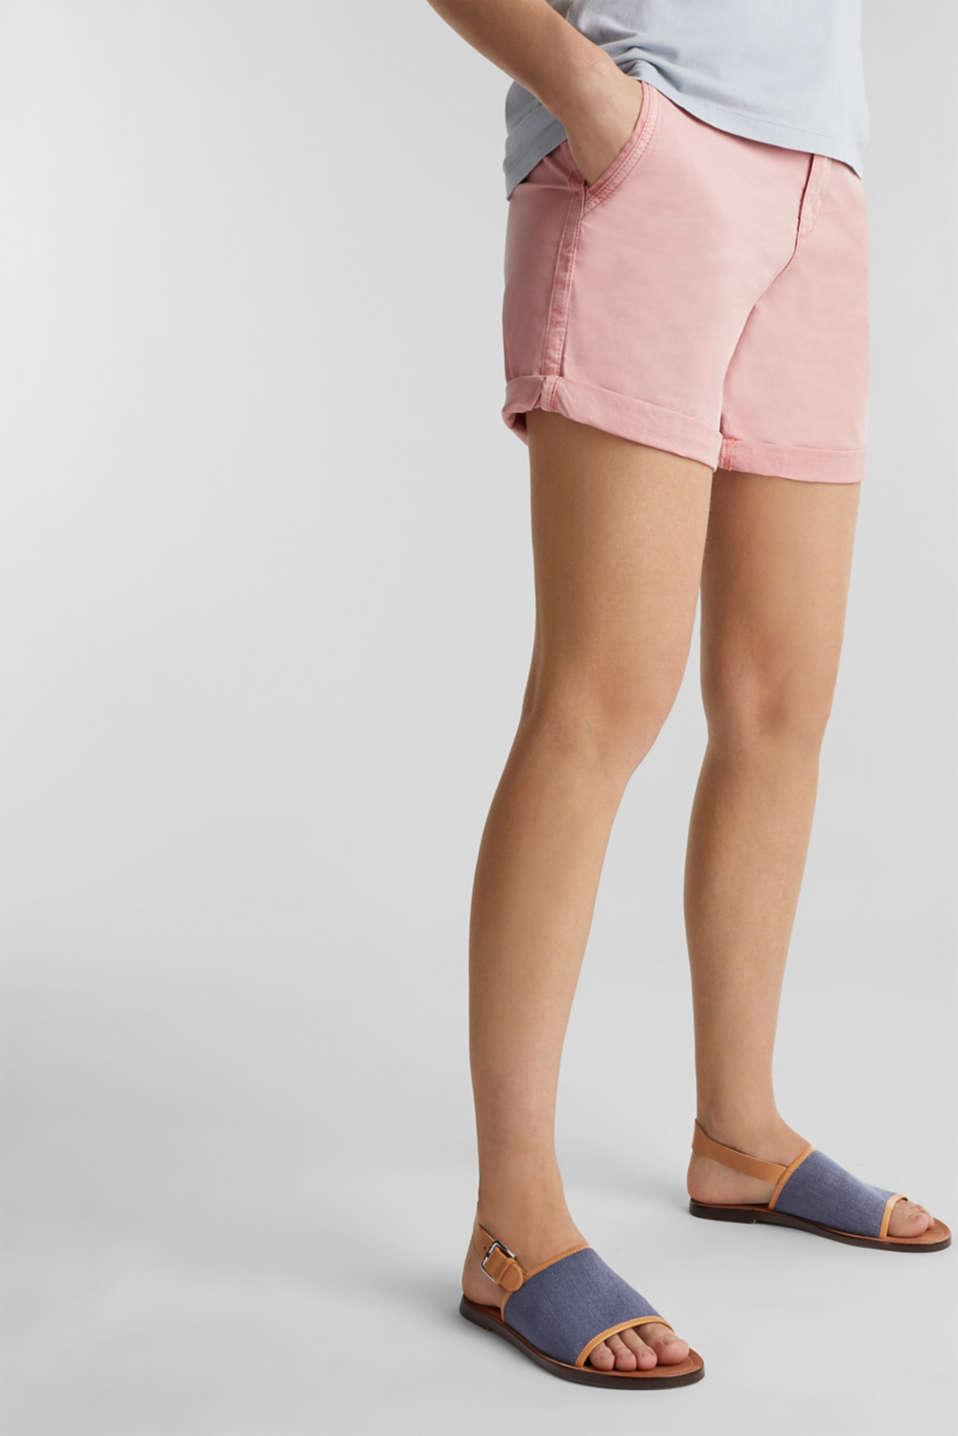 EarthColors® canvas sandals, LIGHT BLUE LAVENDER, detail image number 3